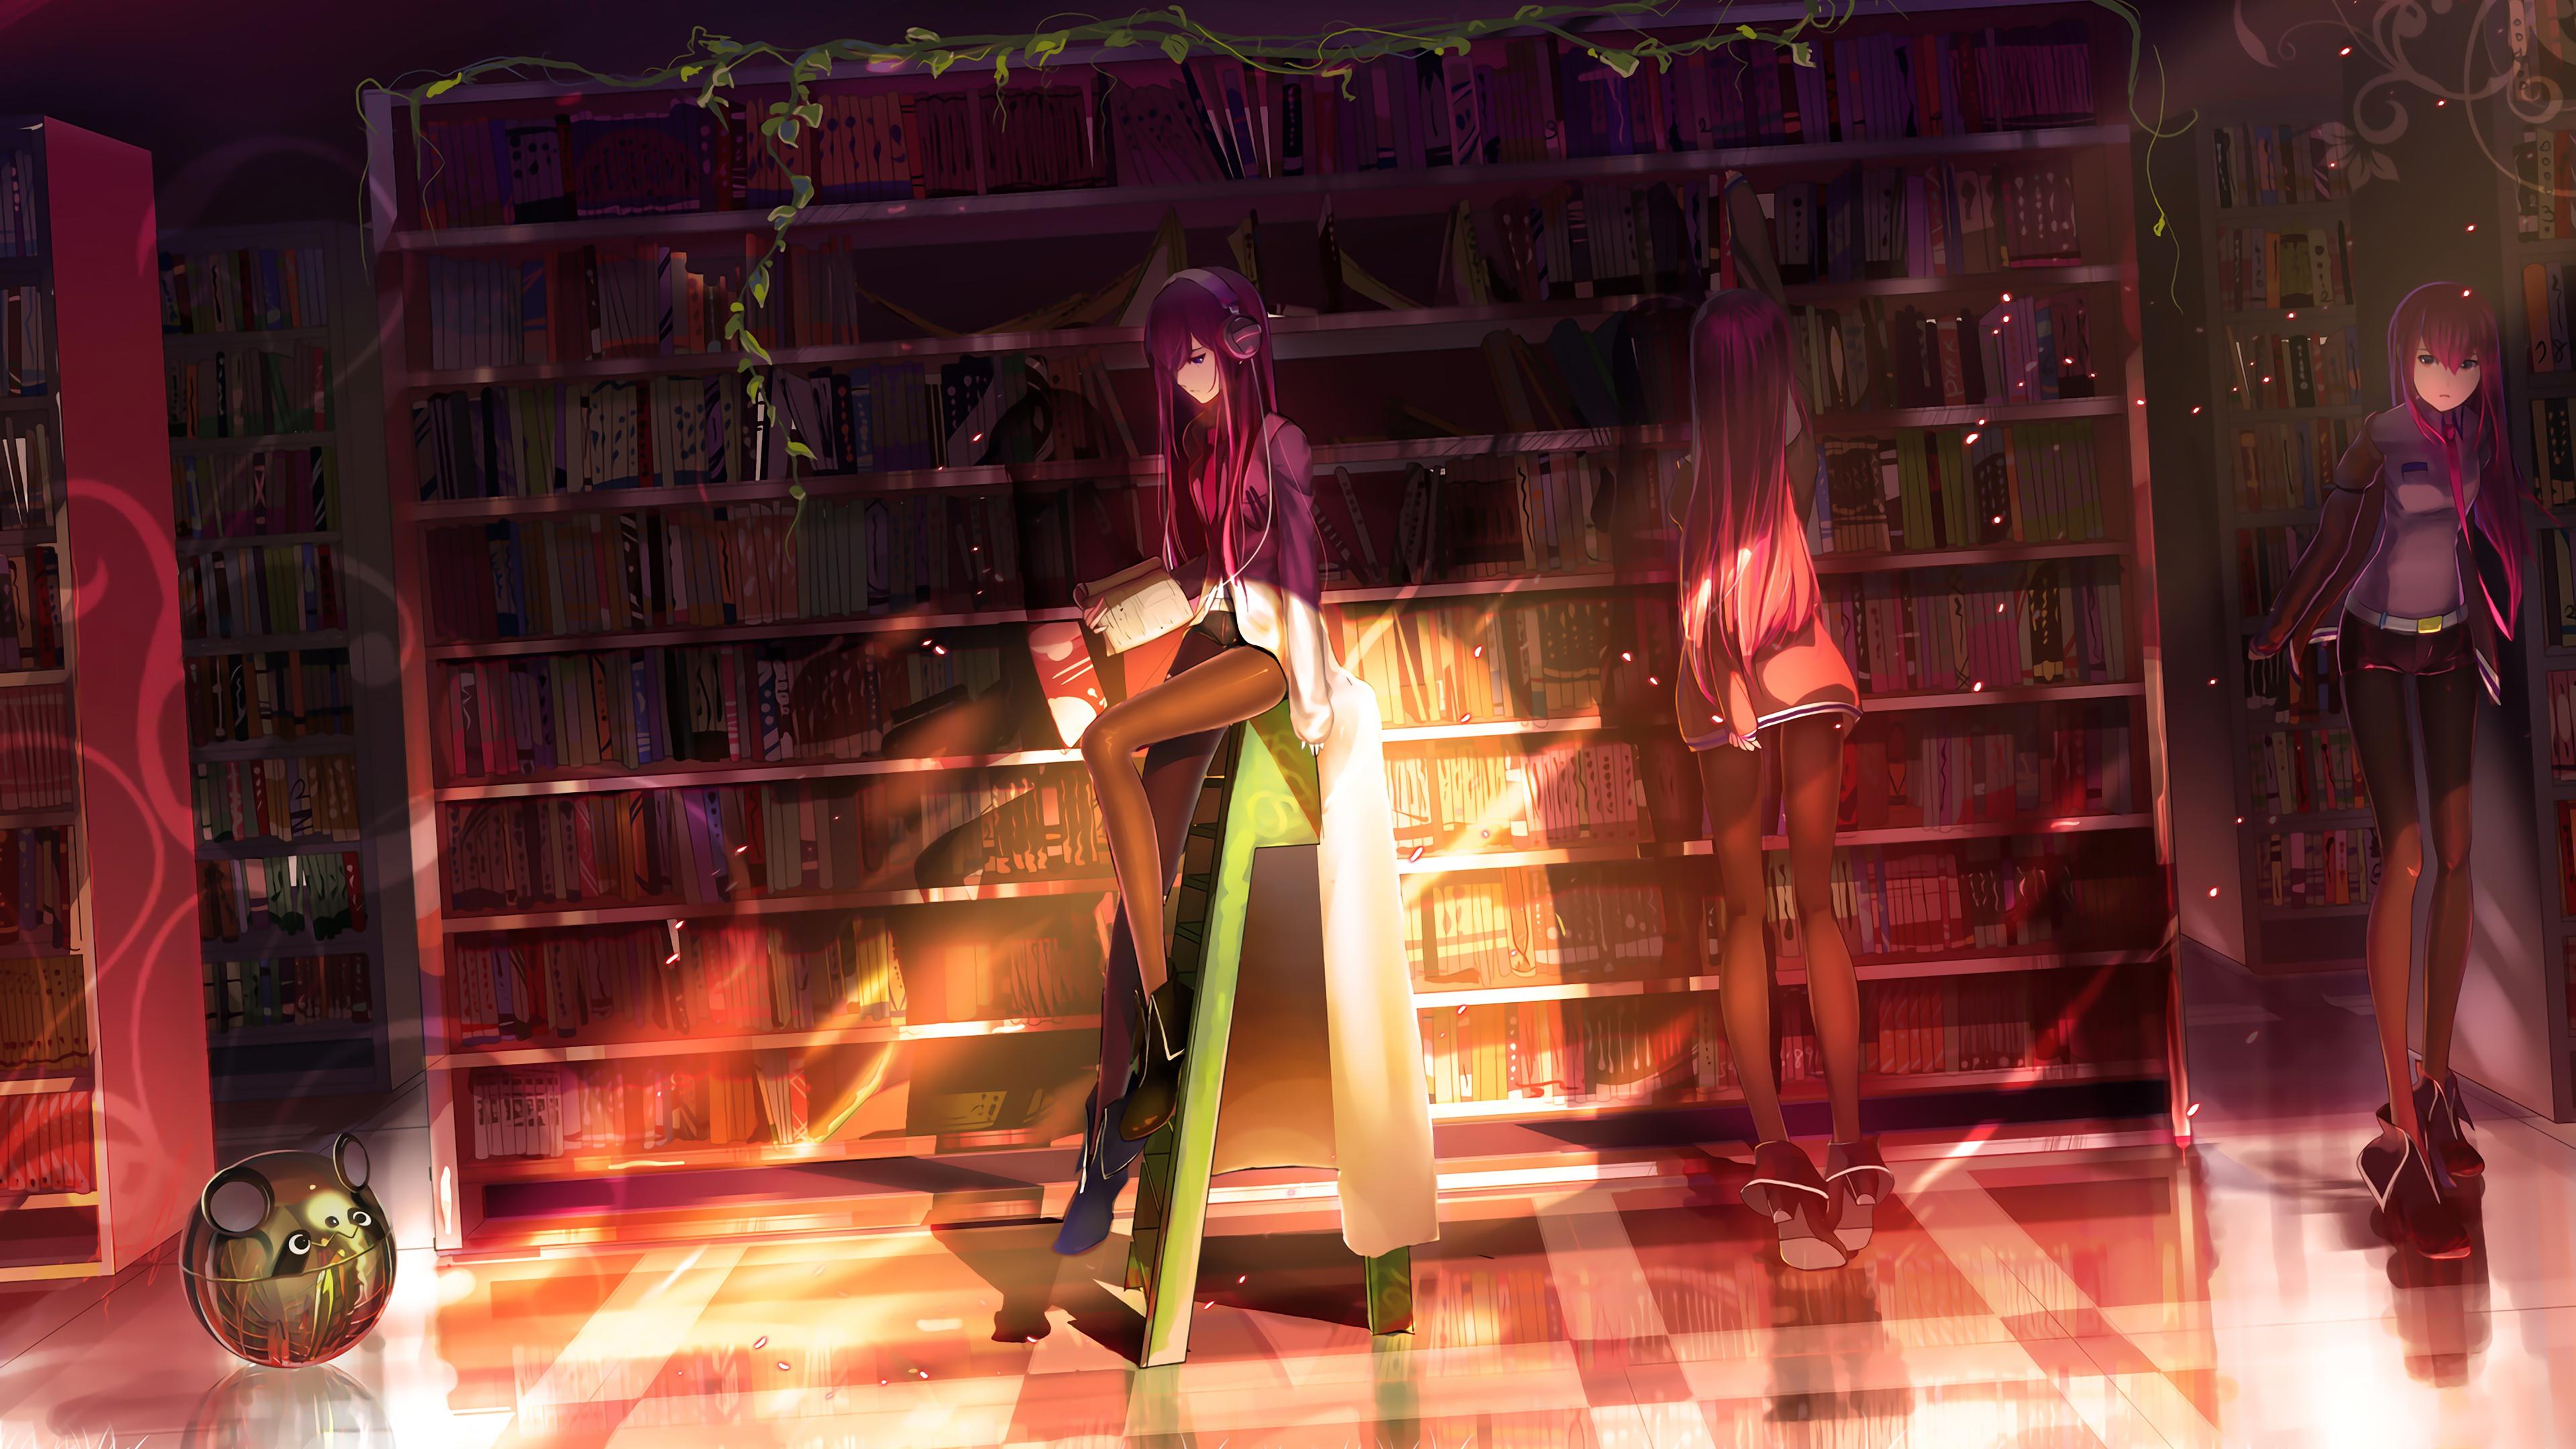 steins gate makise kurisu 4k 1547938675 - Steins Gate Makise Kurisu 4k - hd-wallpapers, digital art wallpapers, artwork wallpapers, artist wallpapers, anime wallpapers, anime girl wallpapers, 4k-wallpapers